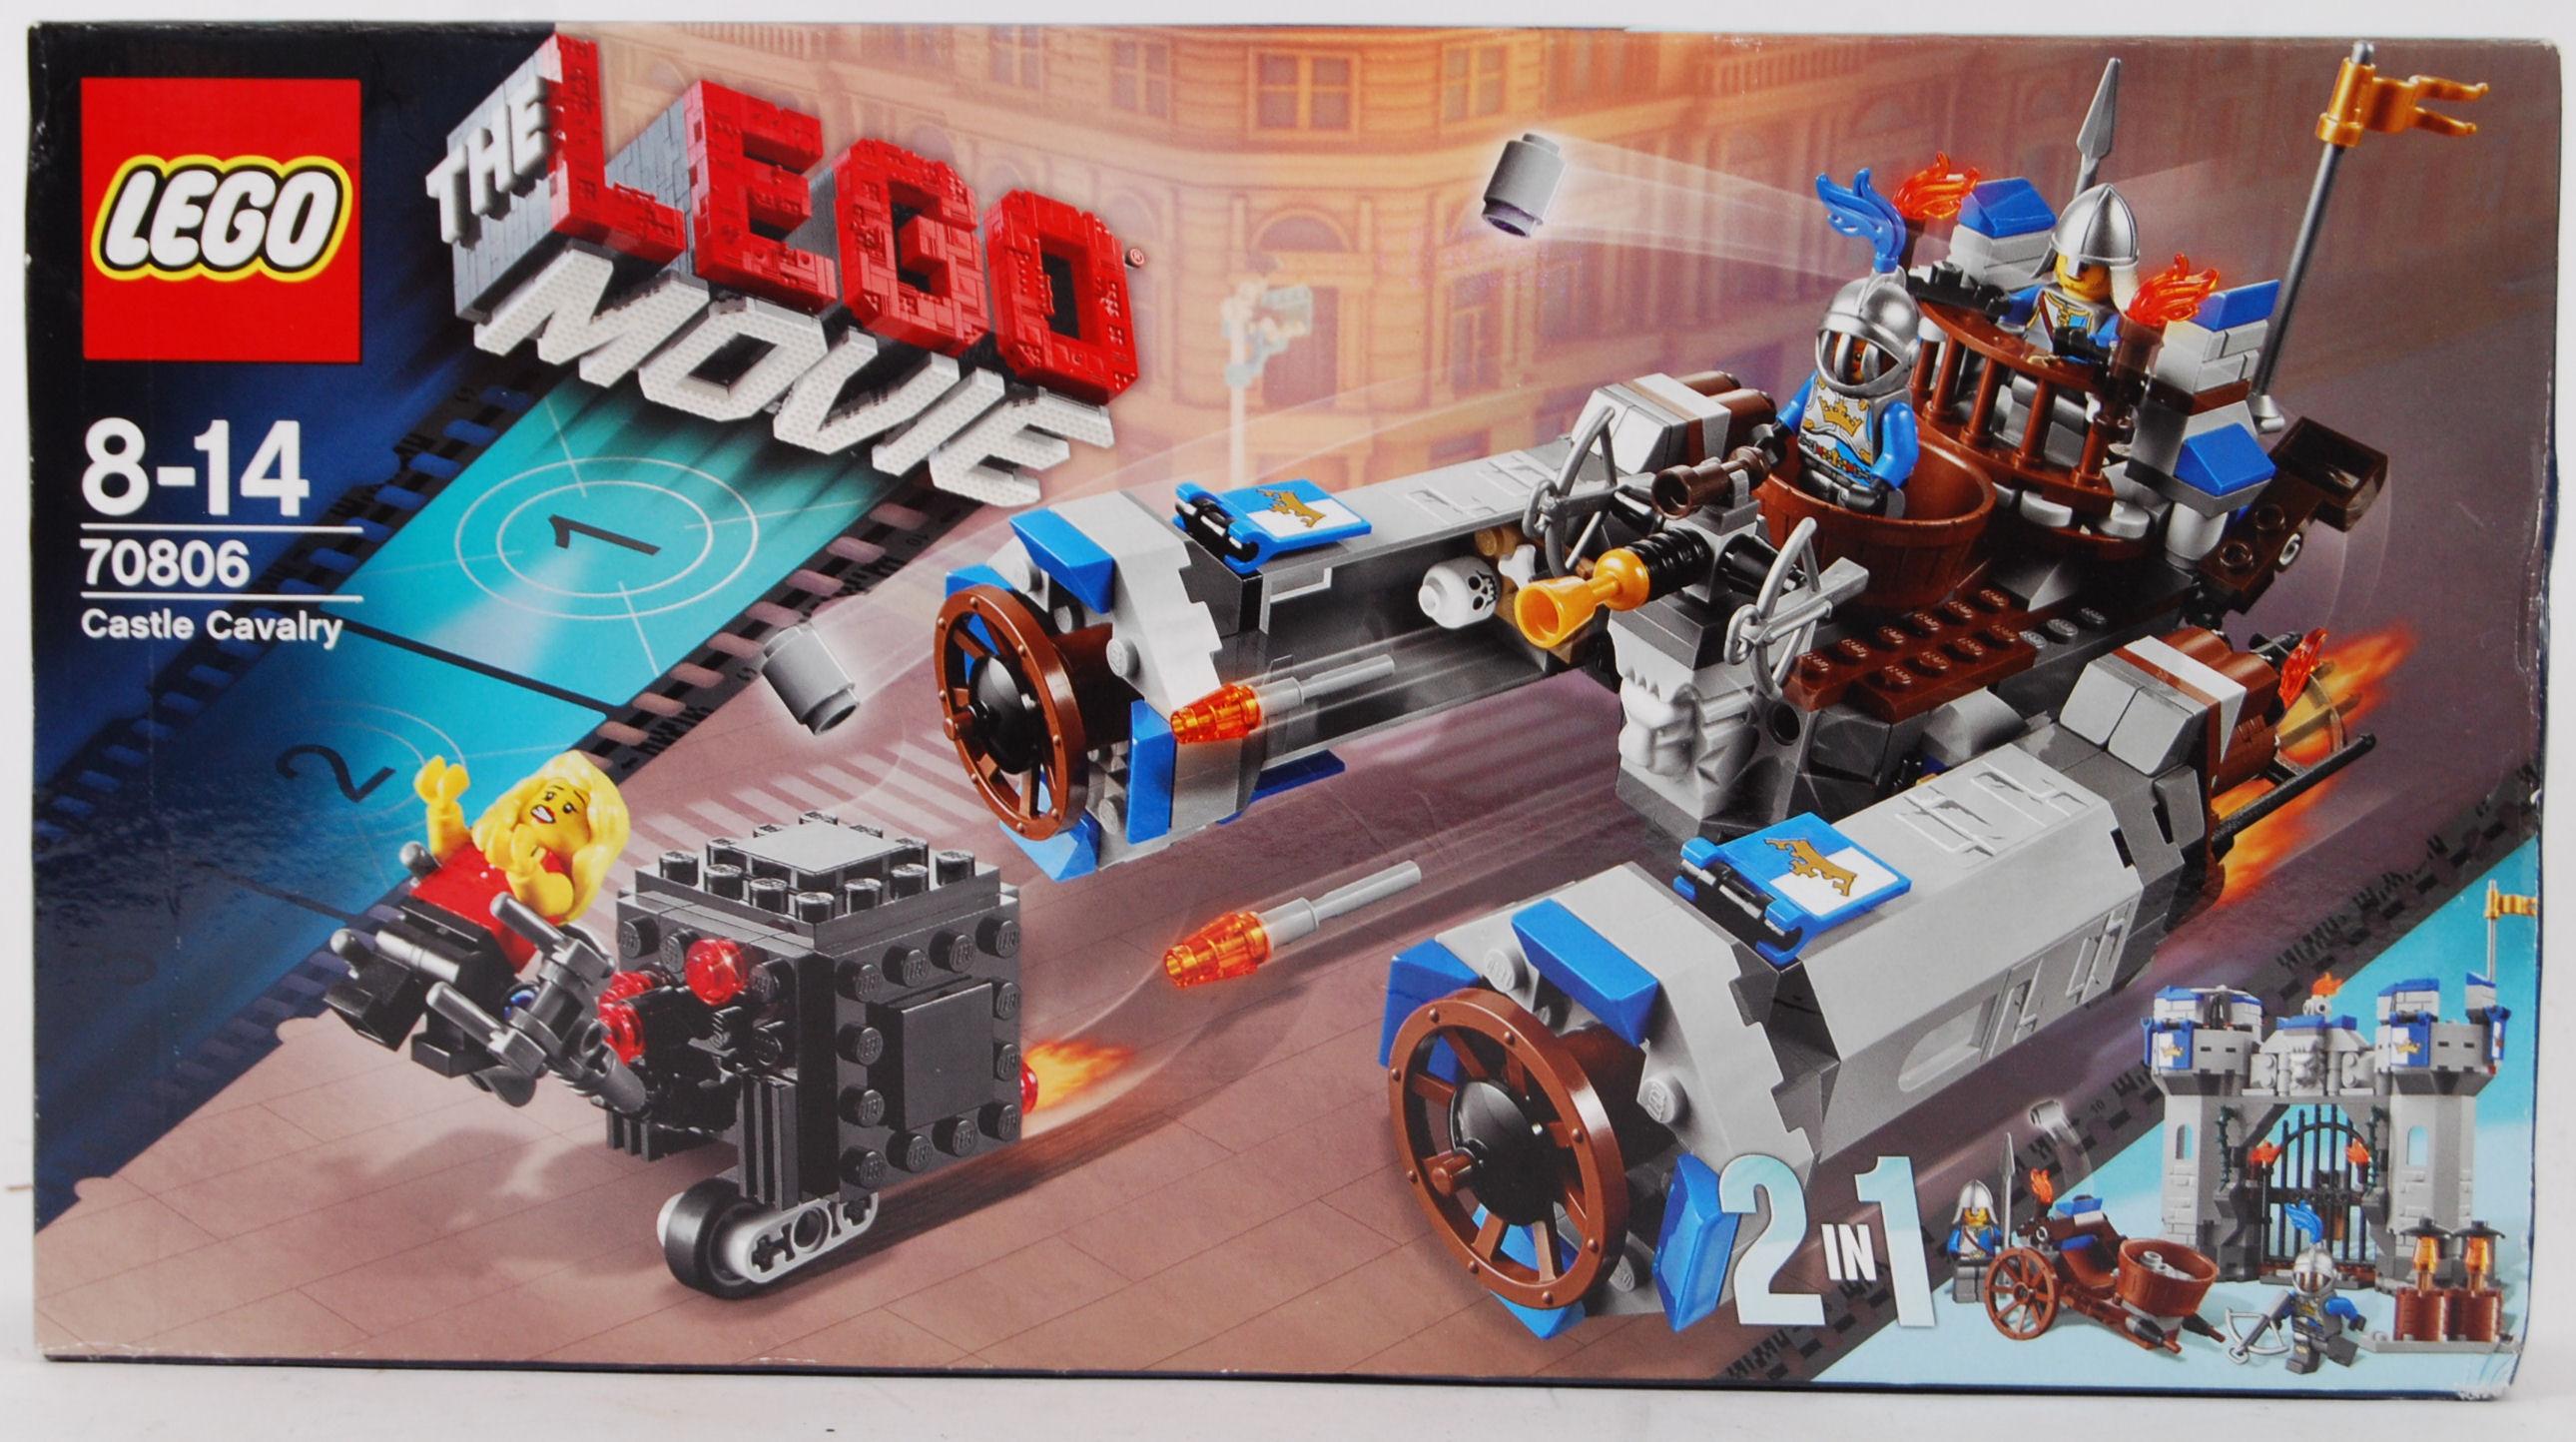 Lego Movie A Lego Movie Set Castle Cavalry 70806 Factory Sealed Unused Within The Original B